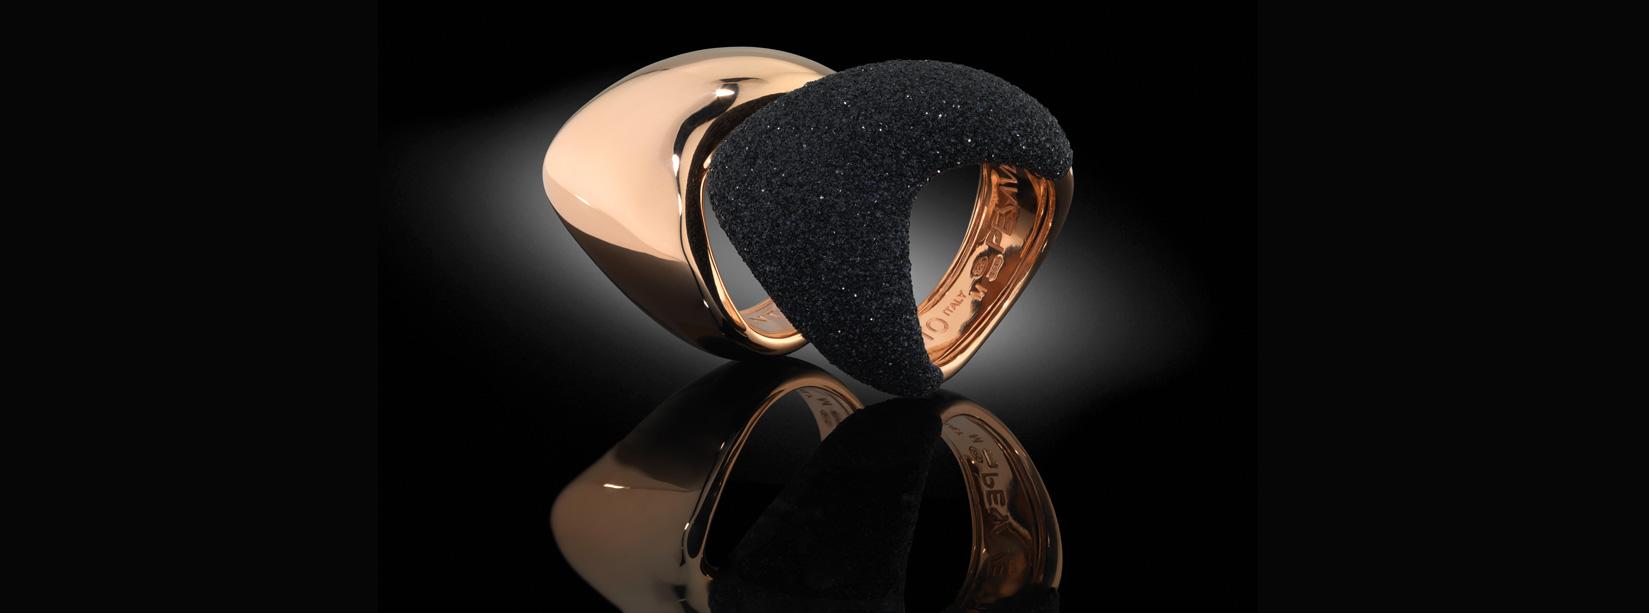 bijoux-argent-bijouterie-vaillant